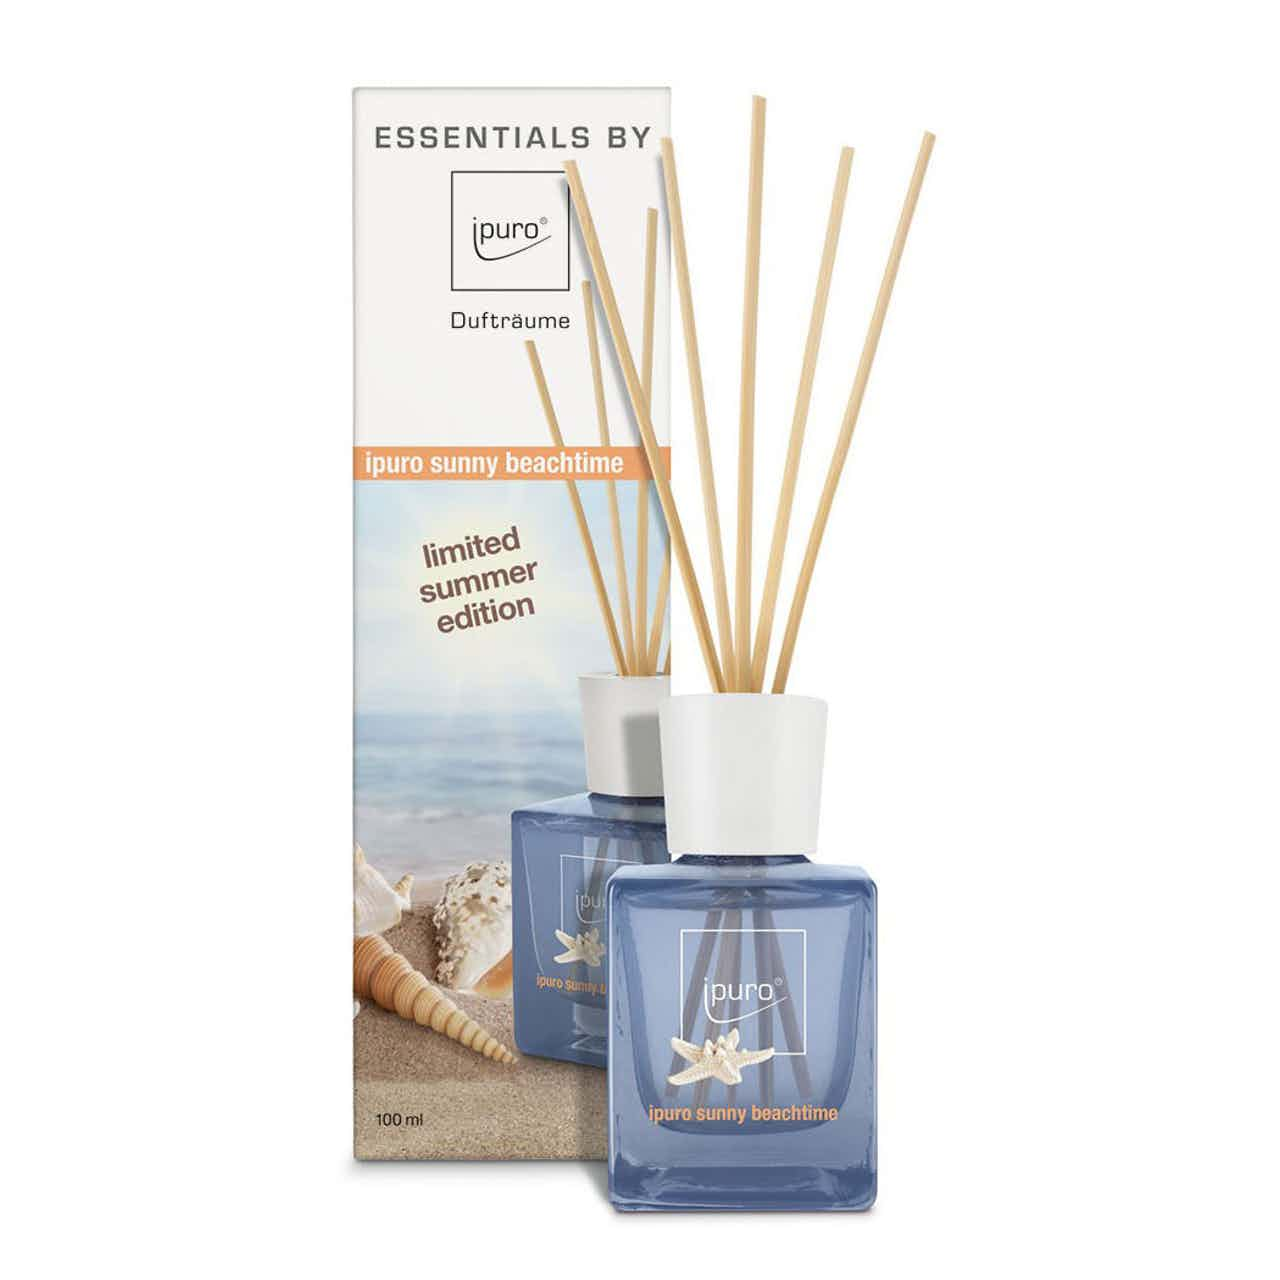 Ipuro Raumduft Essentials Sunny Beachtime